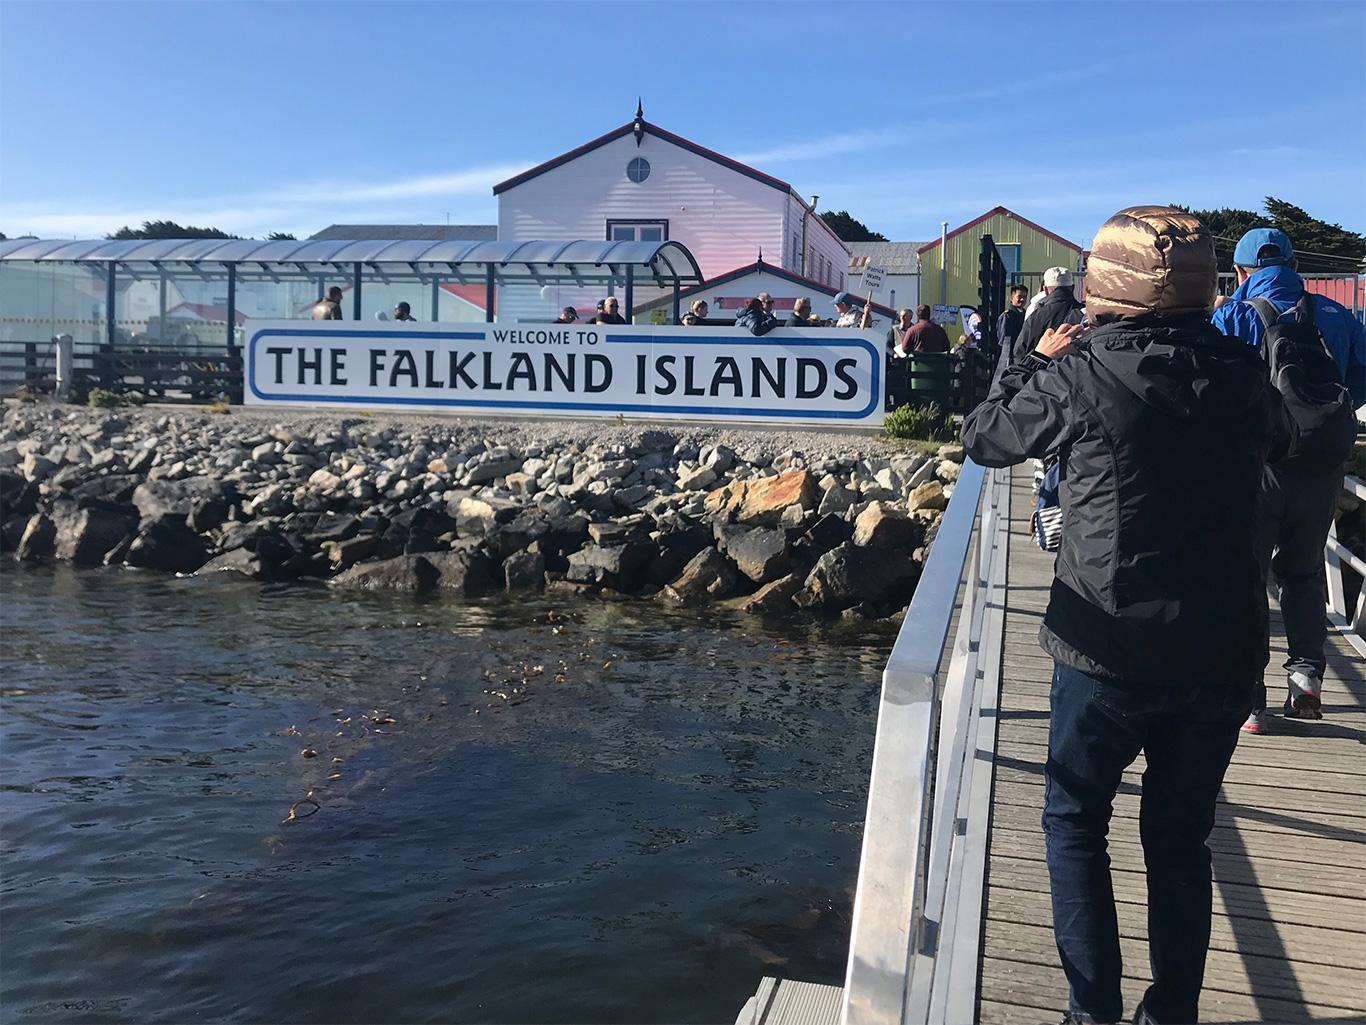 Welcome to Falklands, Port Stanley, Falkland Islands.